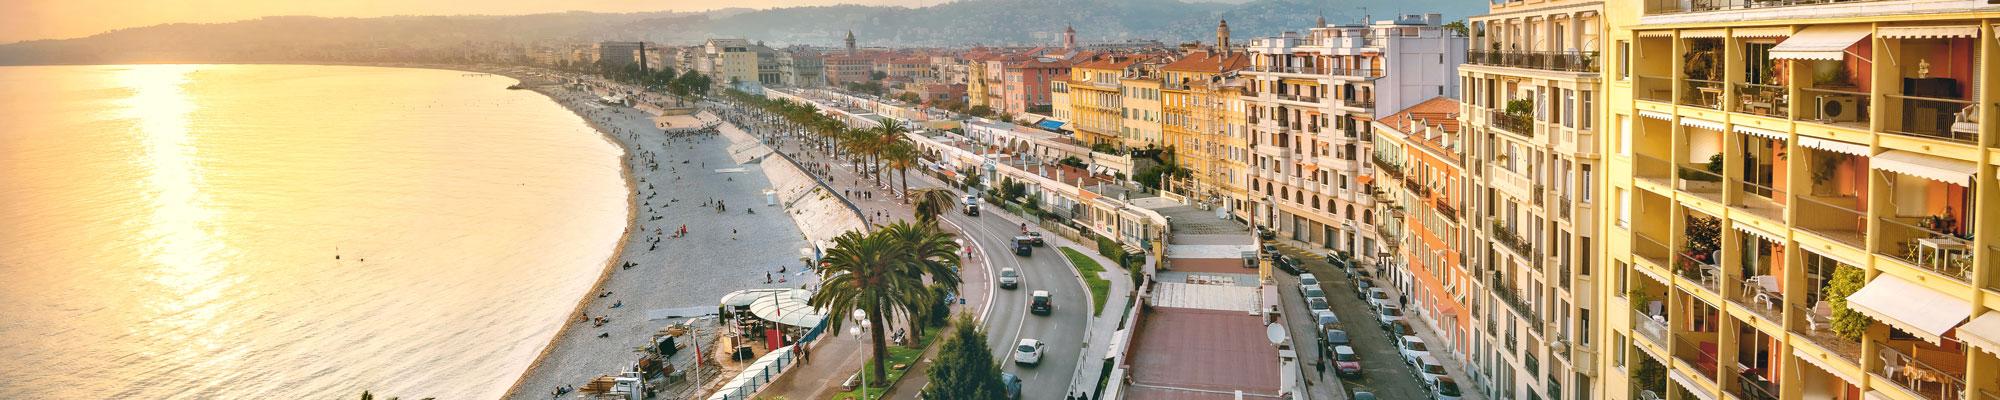 Mastère à Nice / Diplôme Bac+5 en alternance